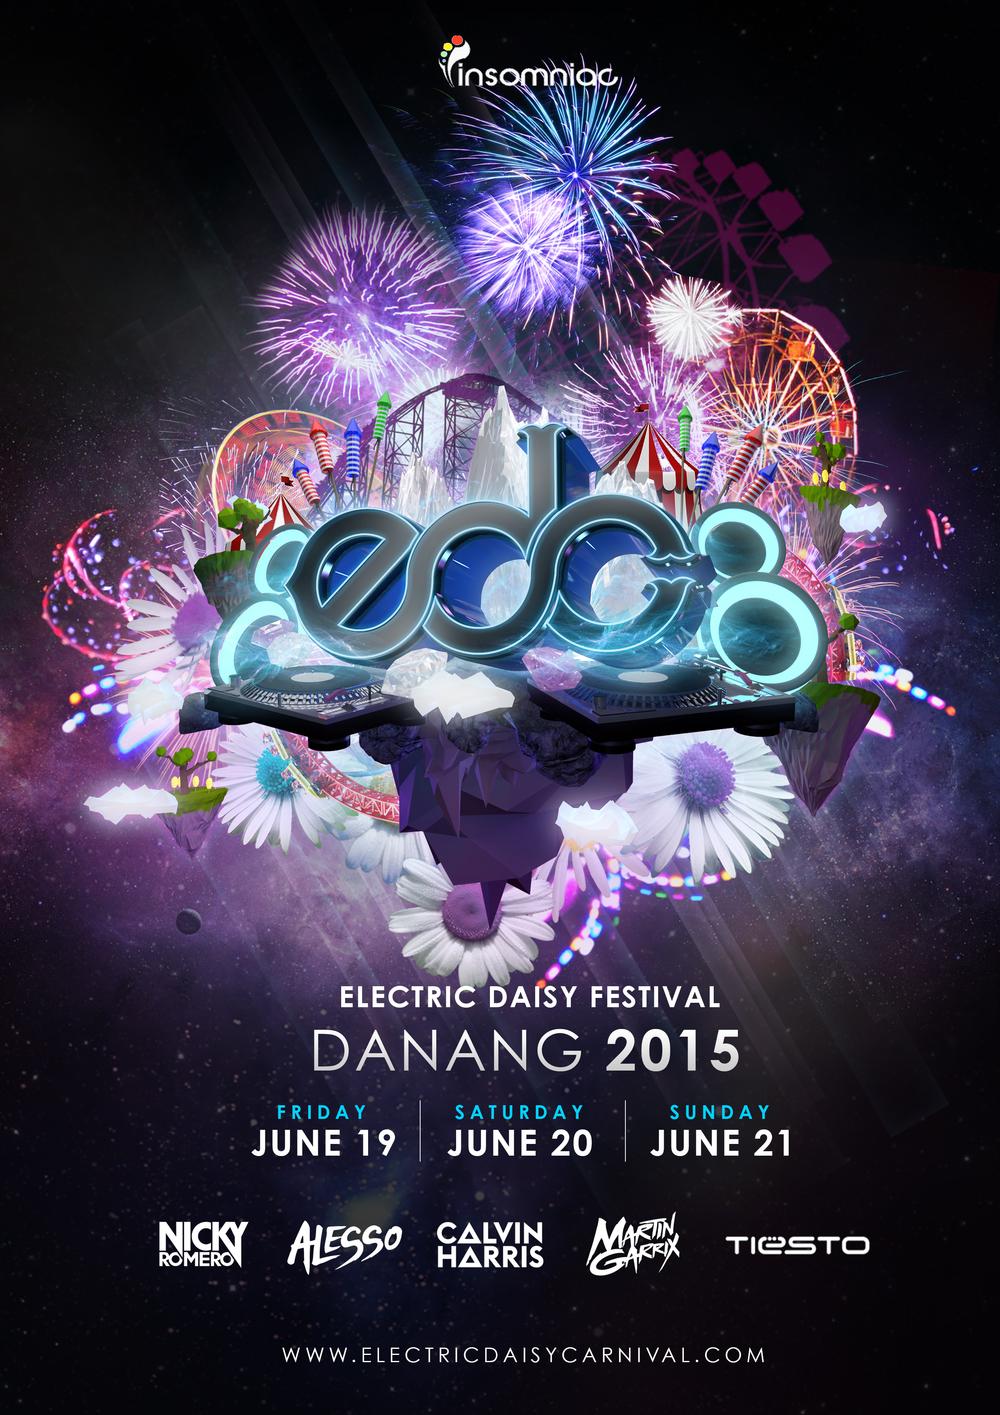 EDC_Poster_Danang.jpg